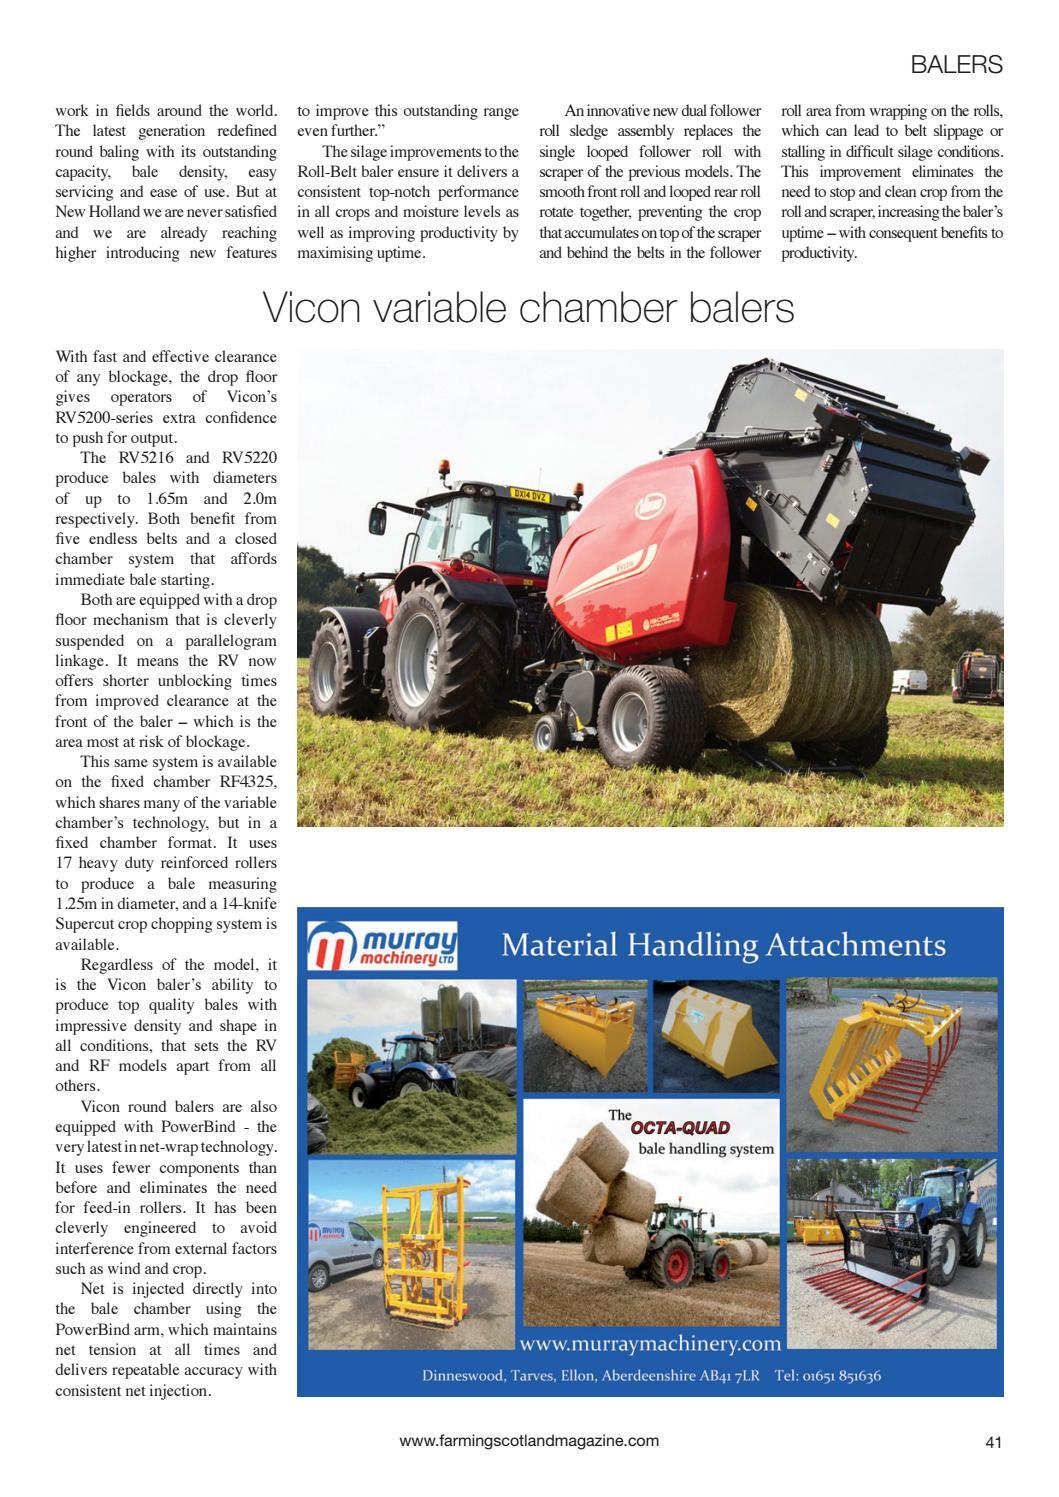 Farming Scotland Magazine (March - April 2018) by Athole Design